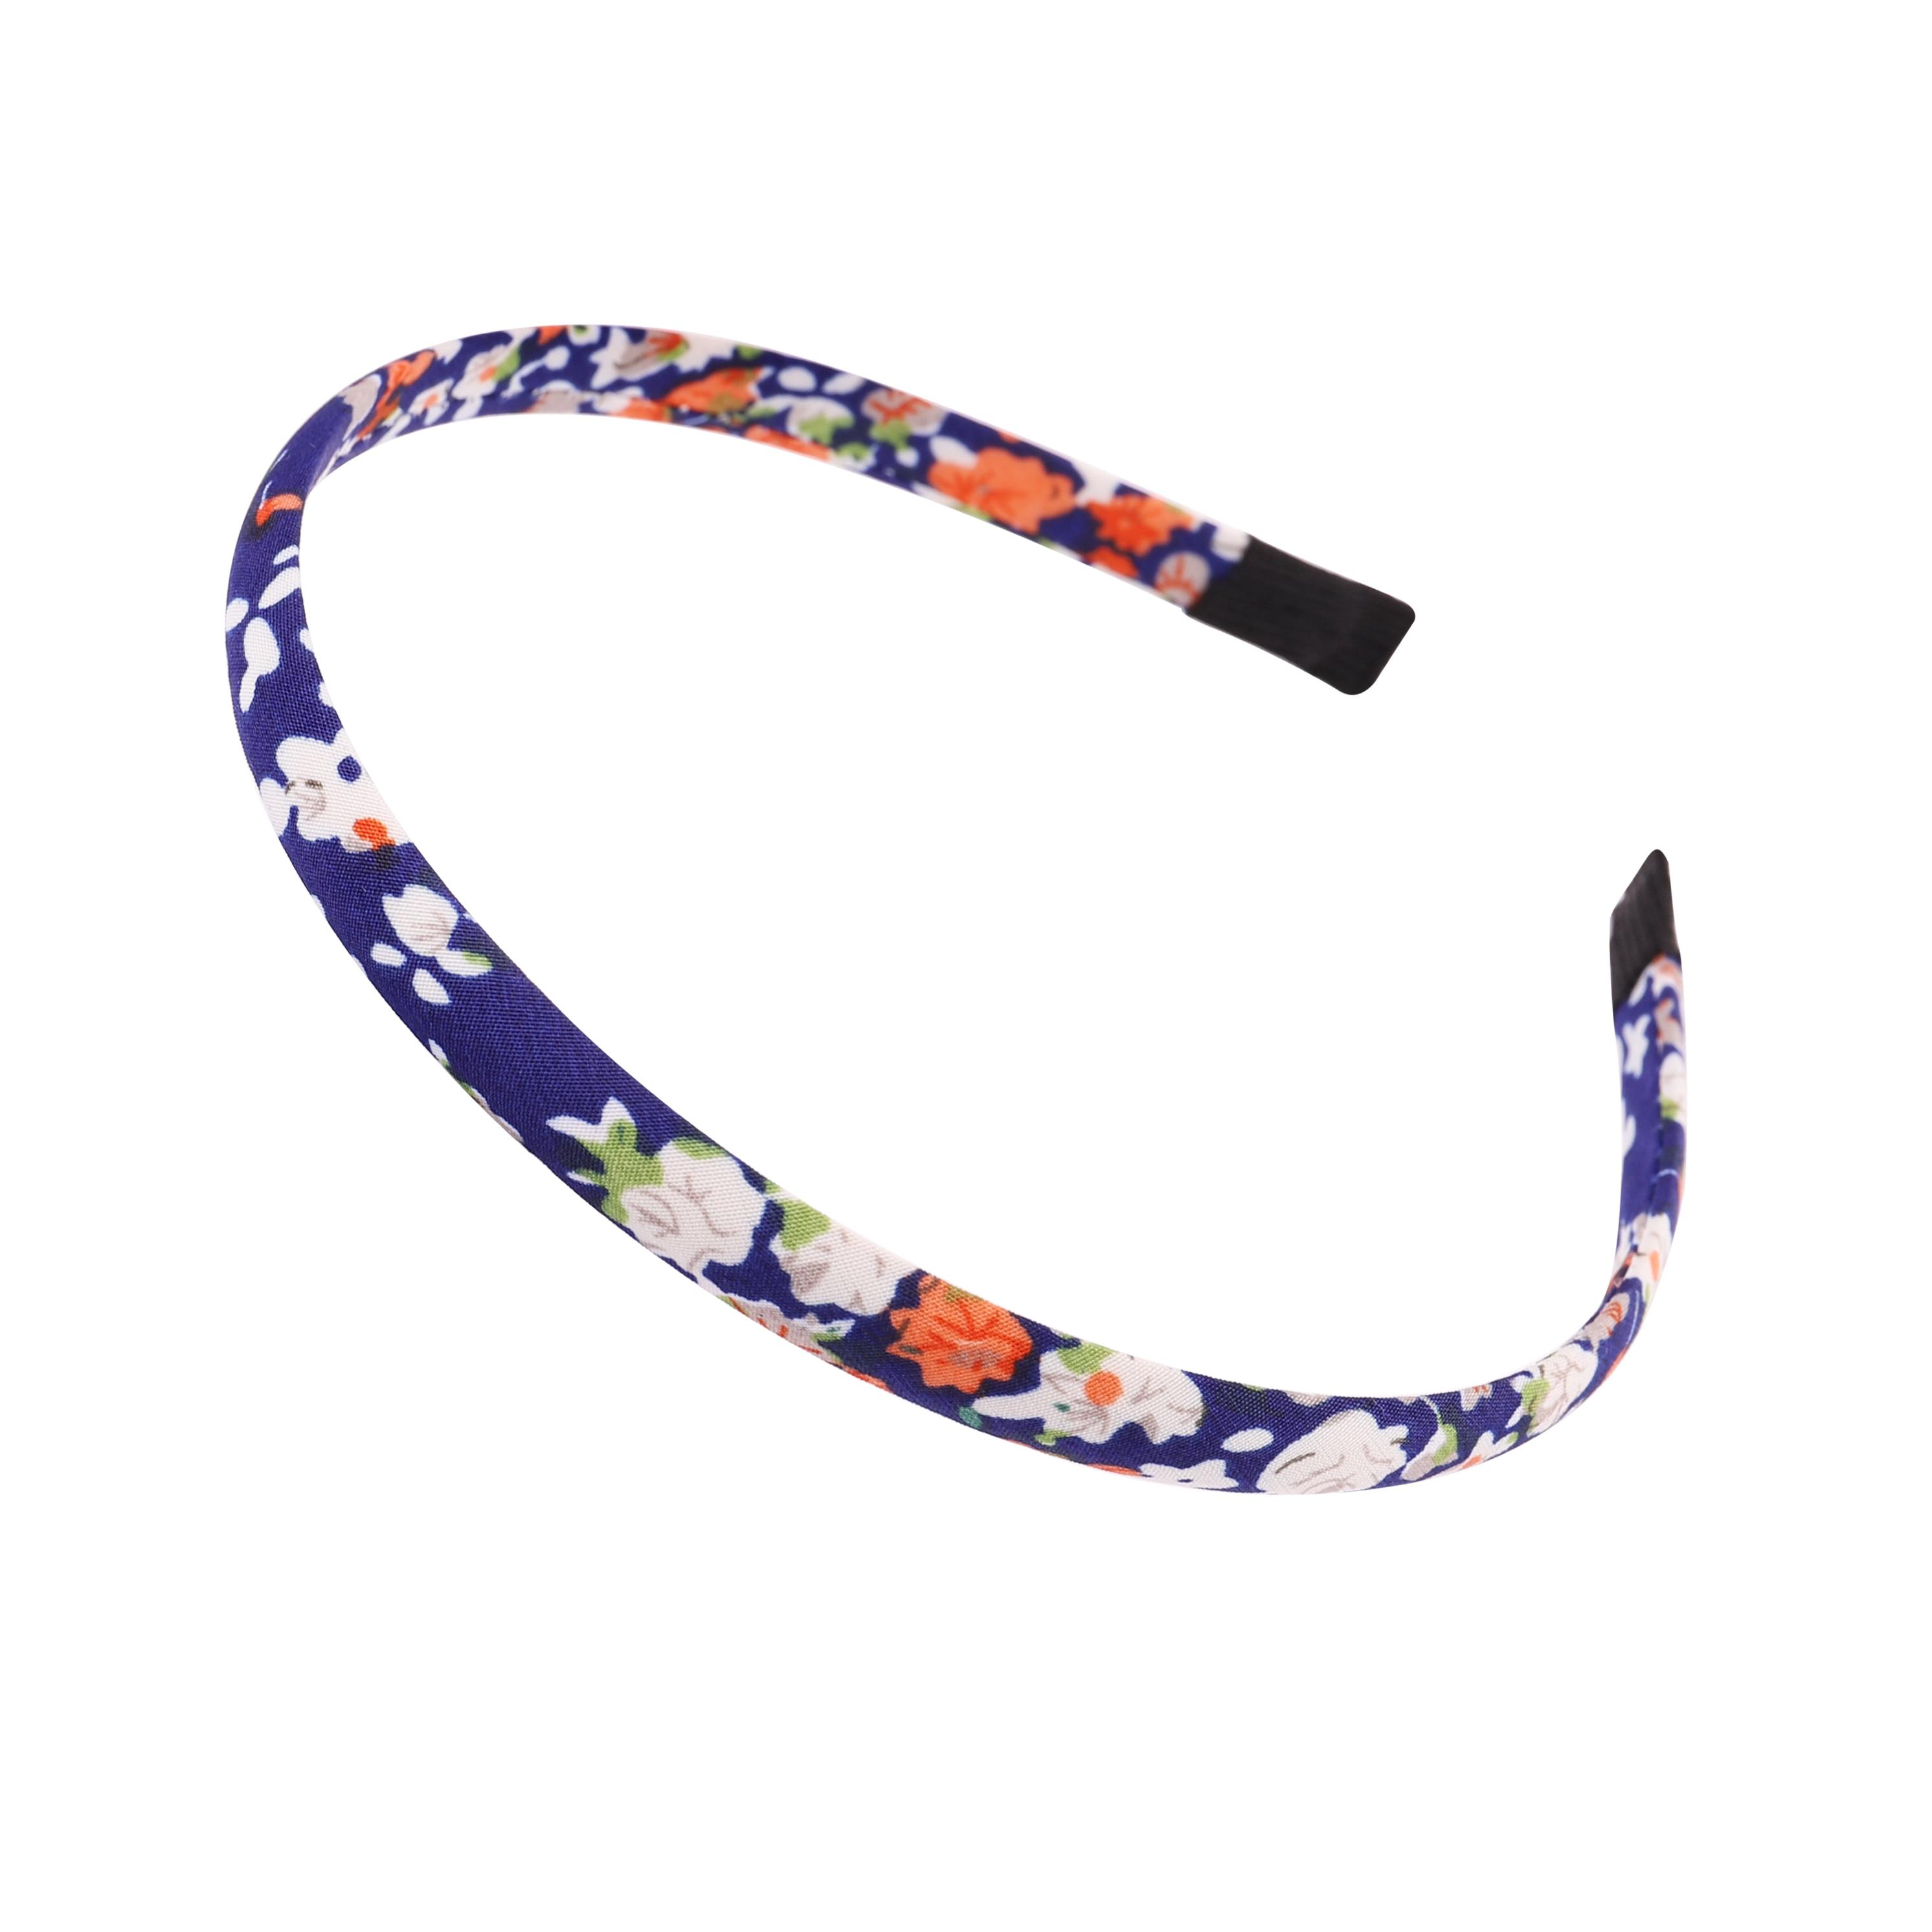 12pcs Bohemia High Elastic DIY Satin Headbands Floral Hair Bands for Women DIY Boho Hair Accessories Turban Headband in Women 39 s Hair Accessories from Apparel Accessories